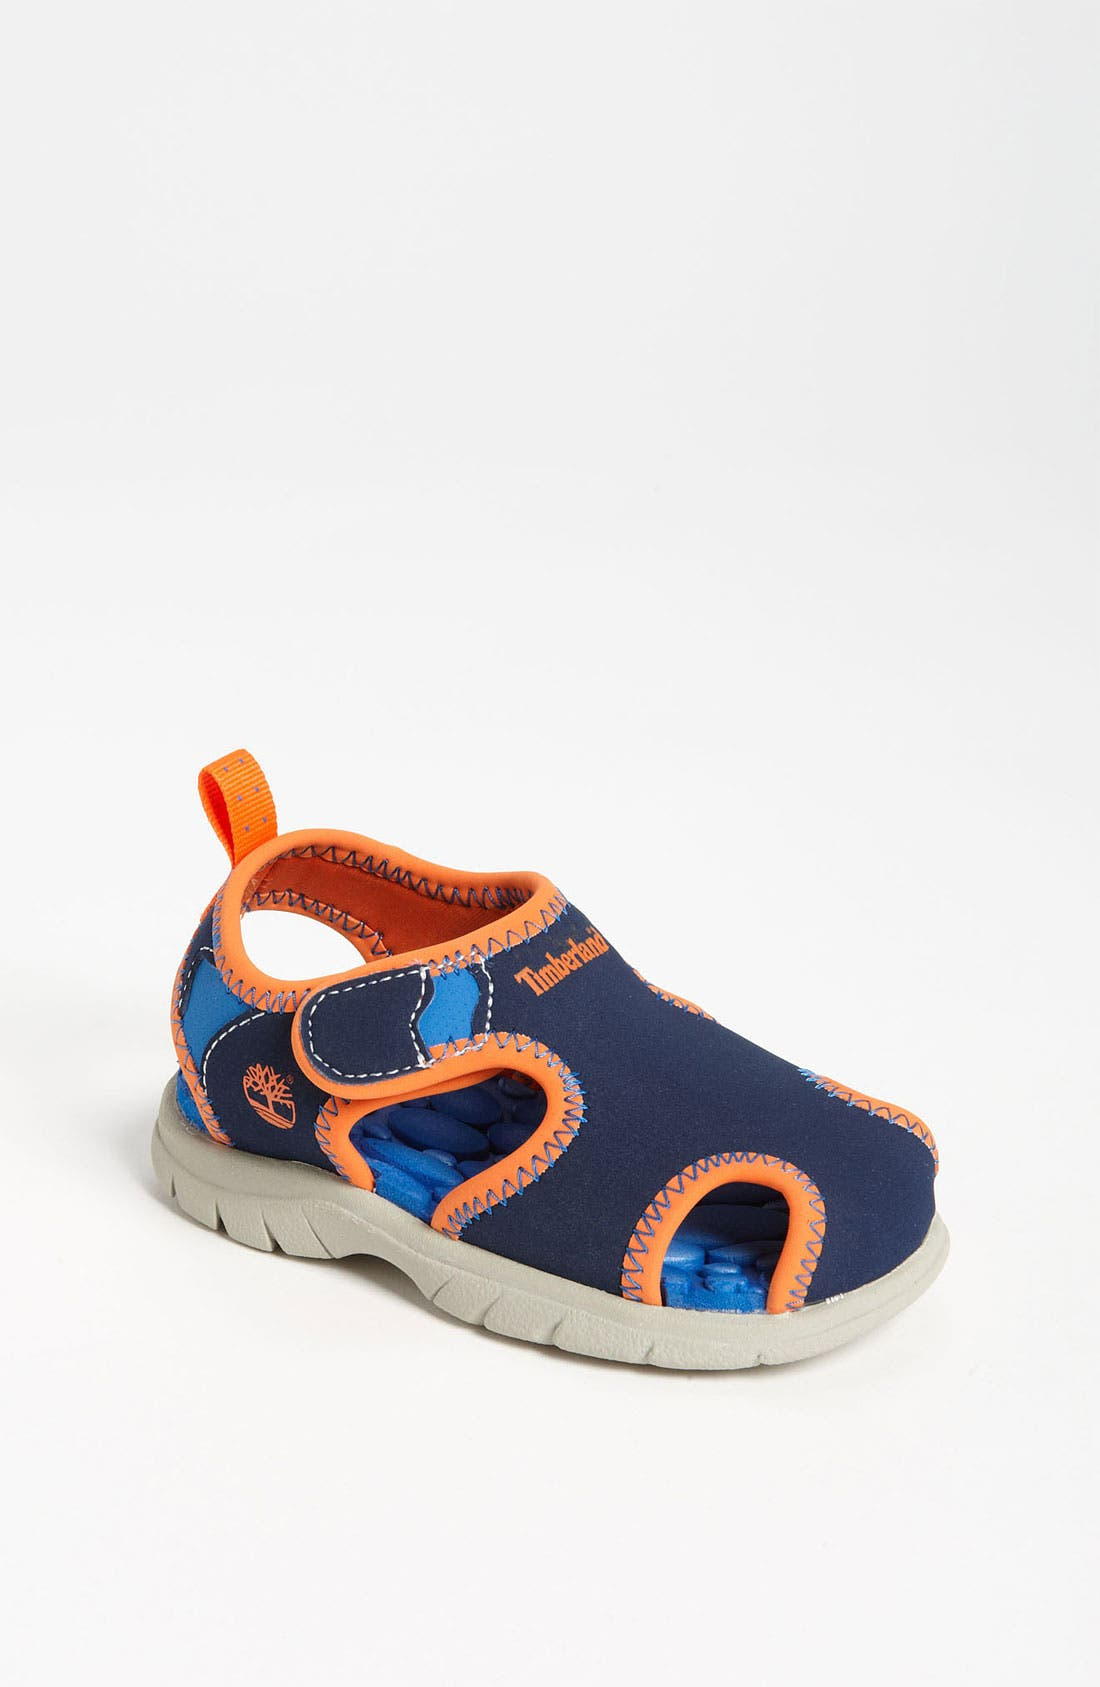 Main Image - Timberland 'Little Harbor' Sandal (Baby, Walker & Toddler)